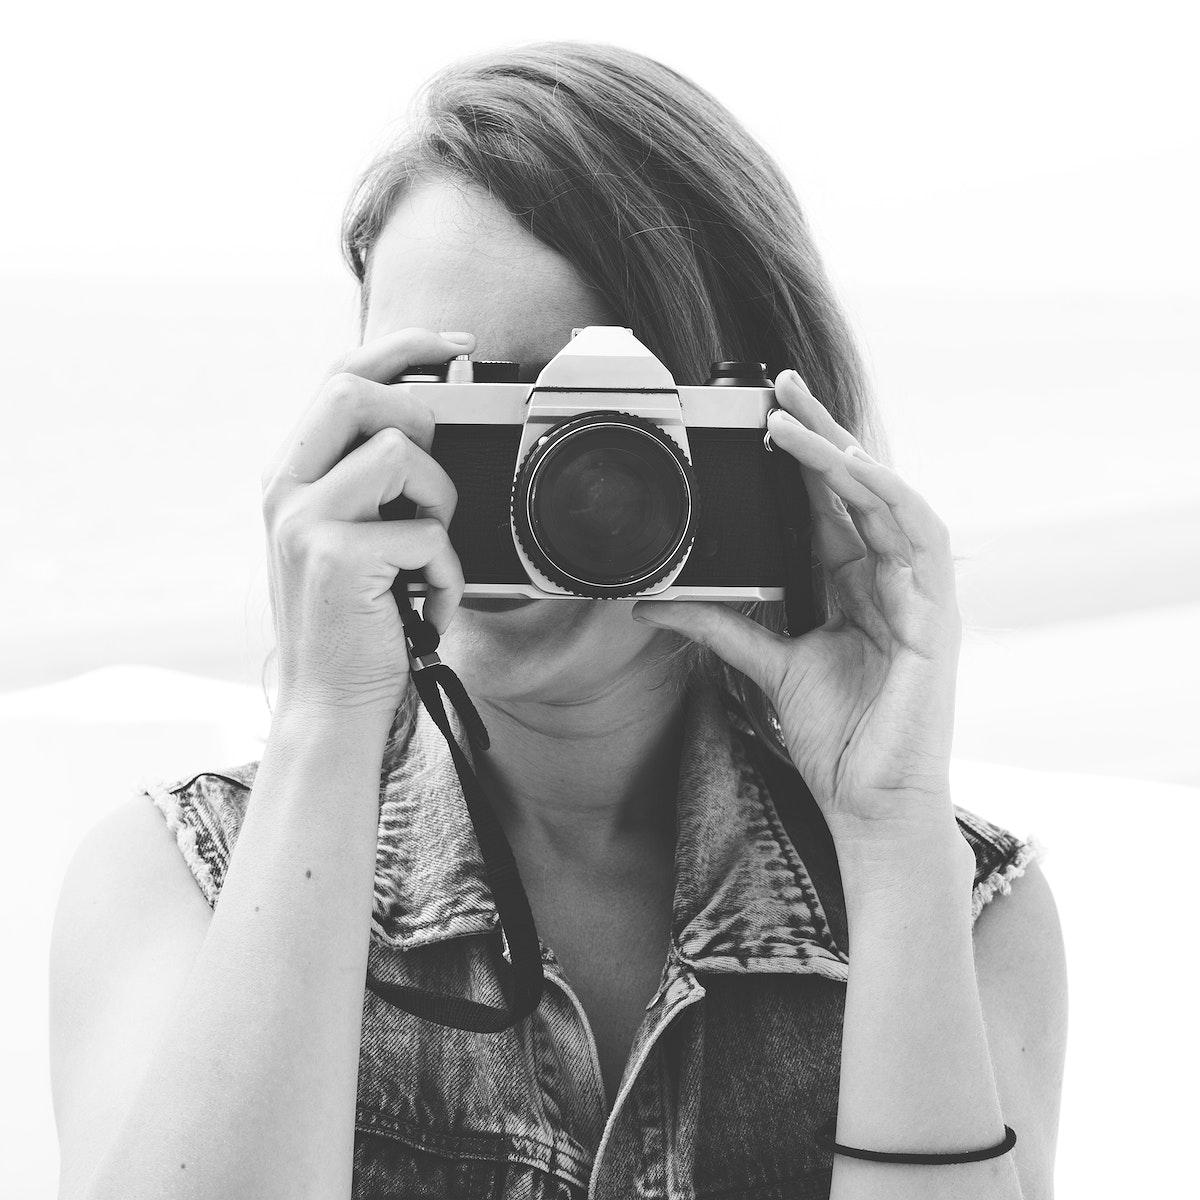 Closeup of woman using camera taking photo grayscale